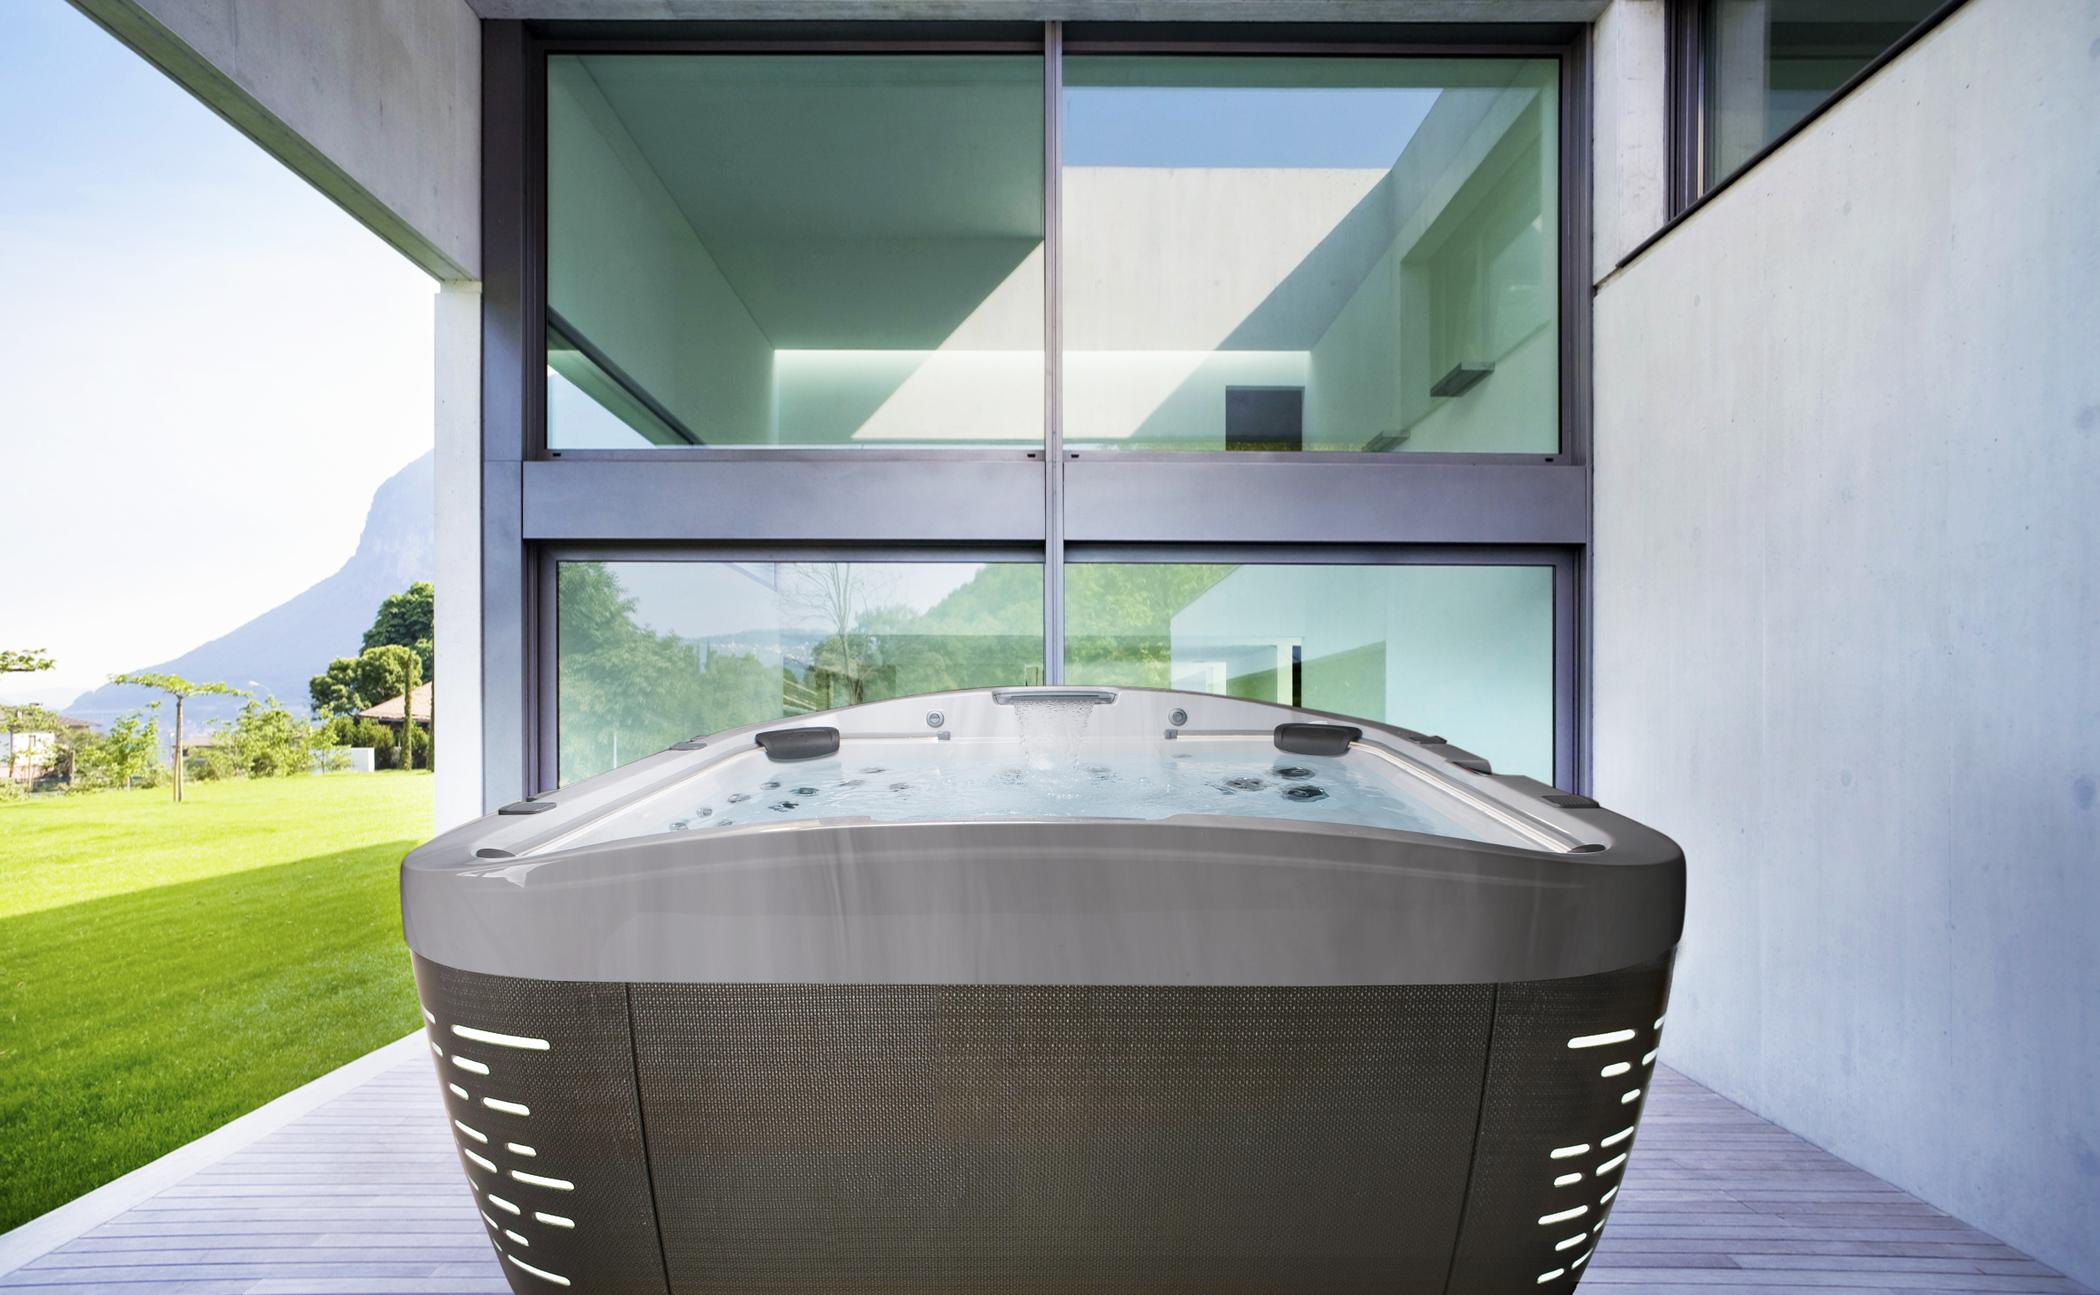 5 Reasons to Buy a Hot Tub